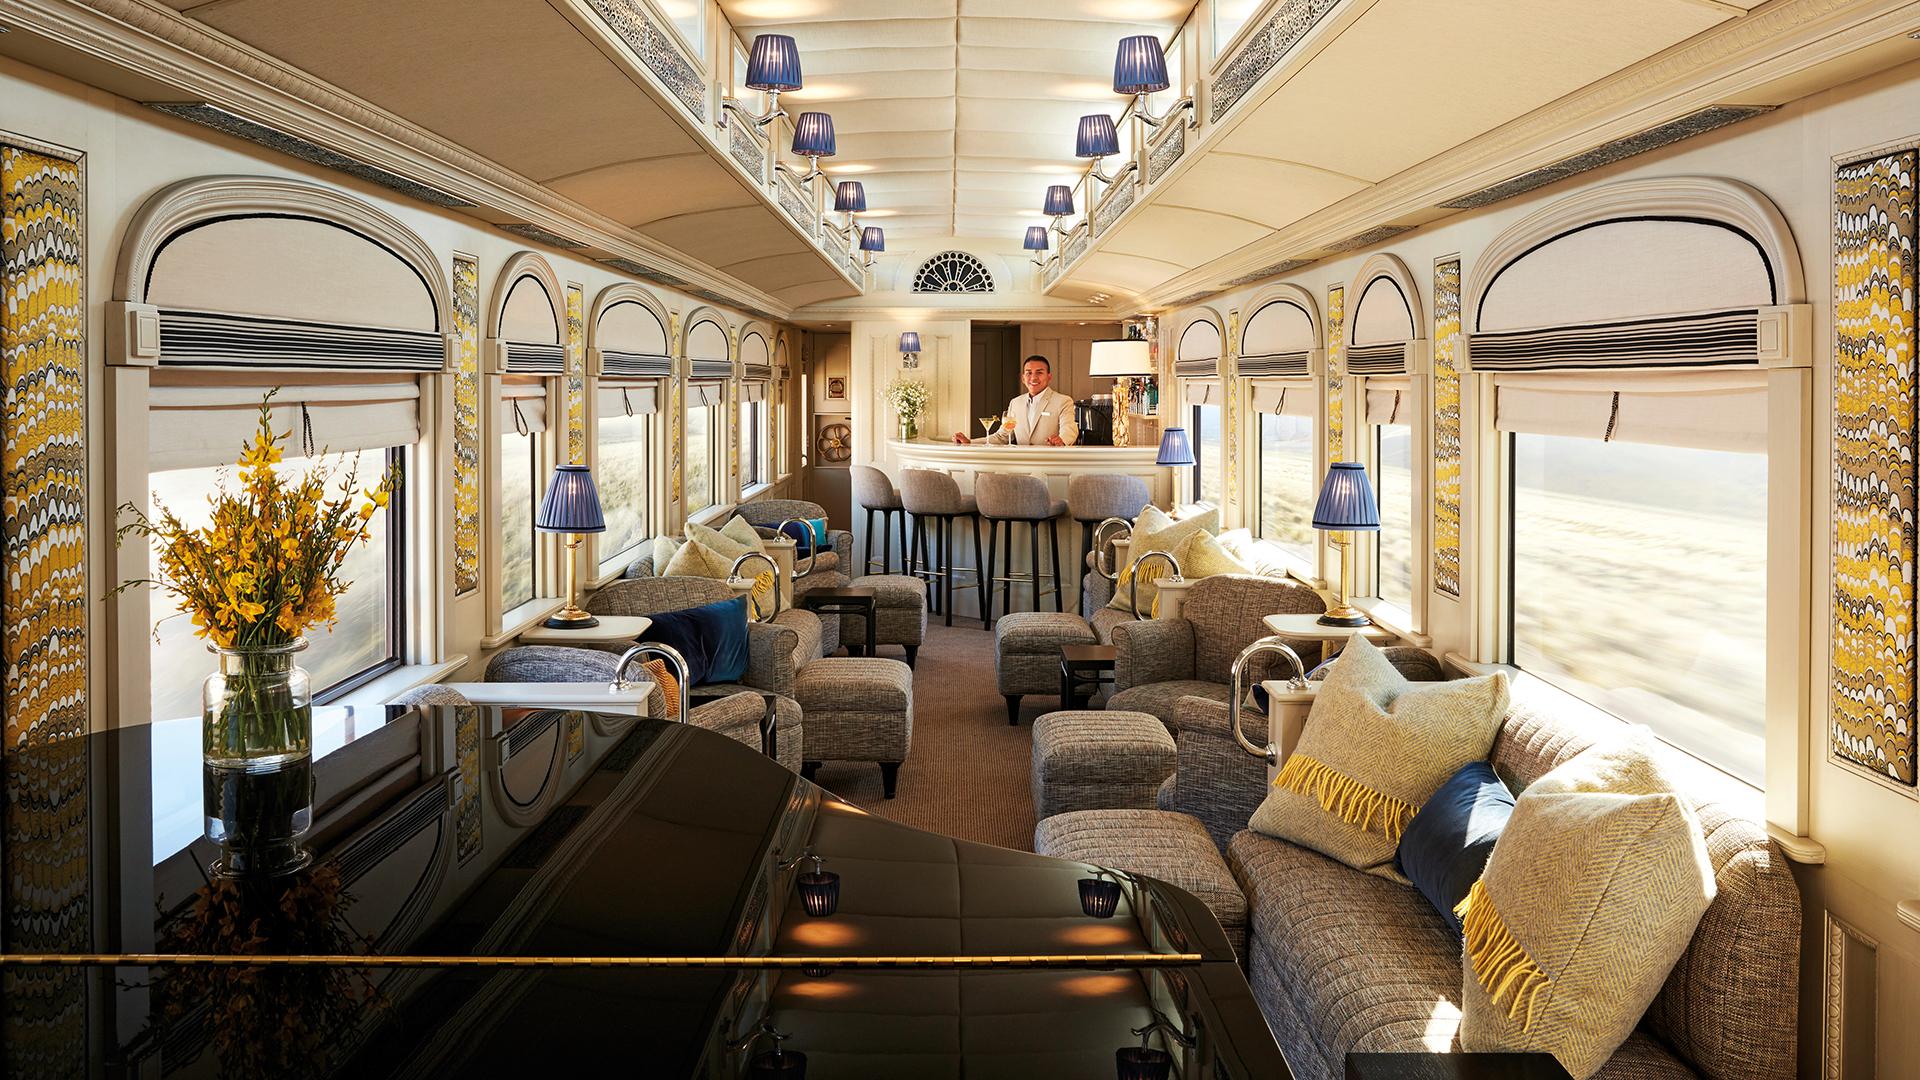 The Lounge Car